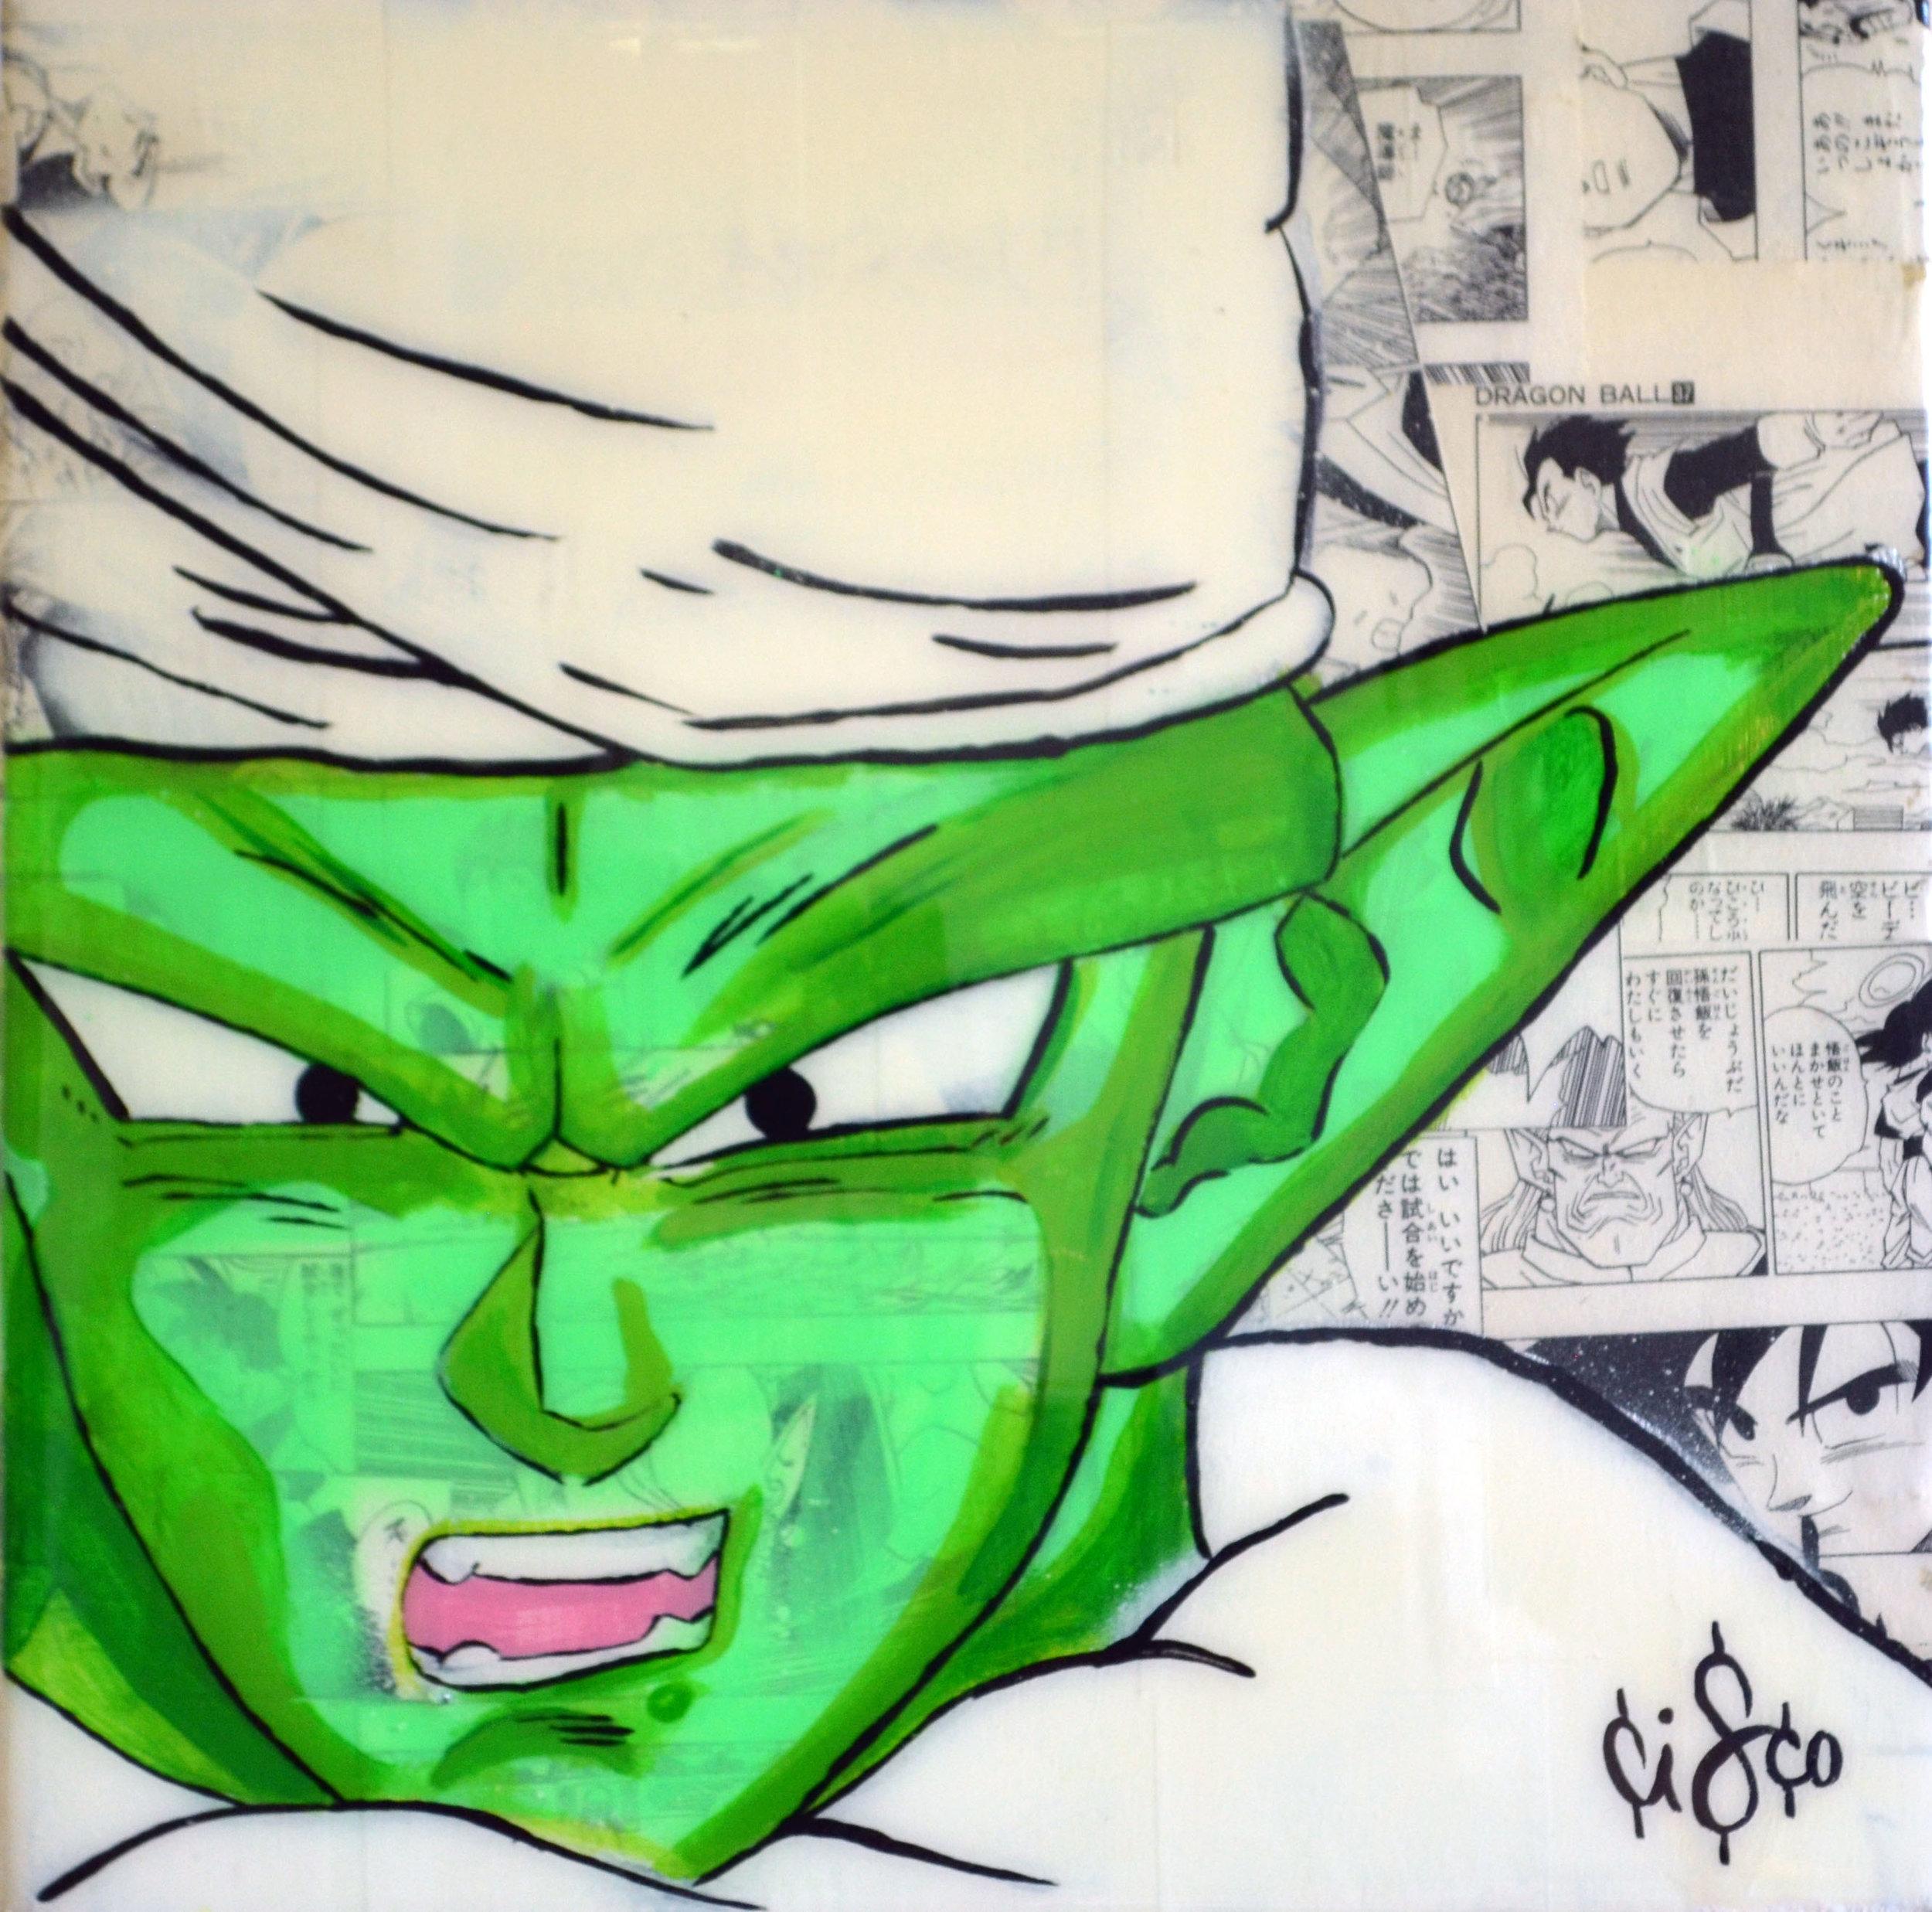 Cisco Lopez Jr Art_Cisco_Piccolo_10inx10in_Acrylic On Wood Panel Canvas_Edition 1of1_2018_$250.jpg